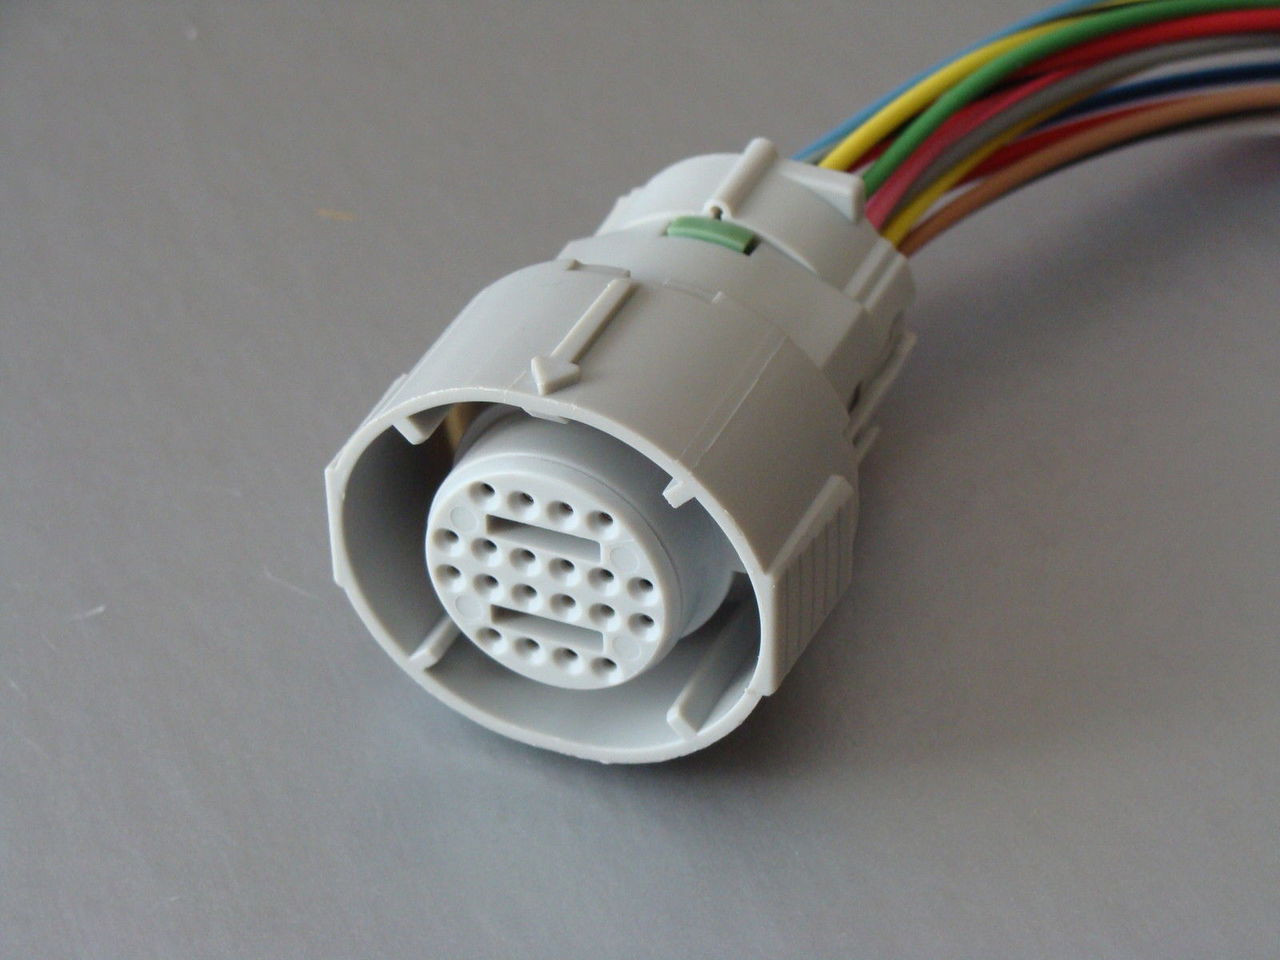 medium resolution of 94 02 ls1 lt1 4l60e automatic transmission harness connector hawks lt1 4l60e wiring harness